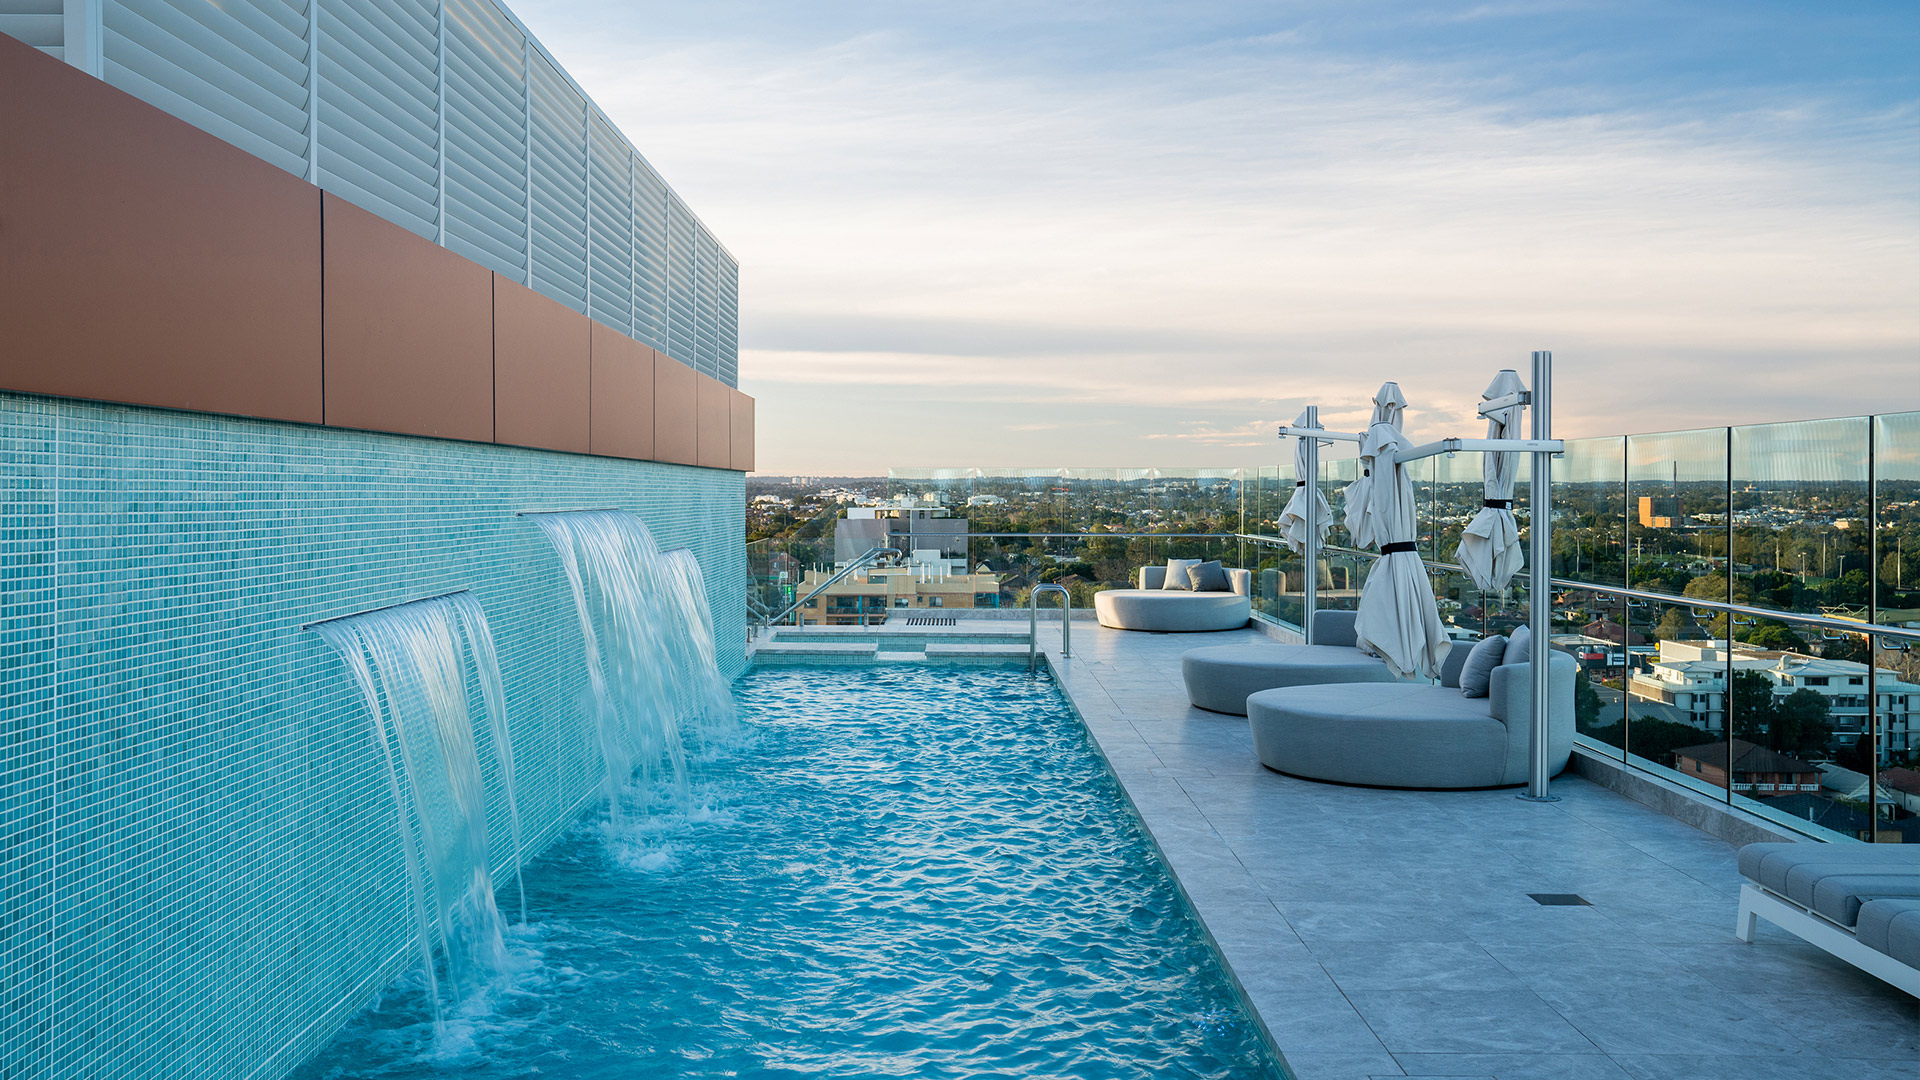 Conquest™ Crowne Plaza pool